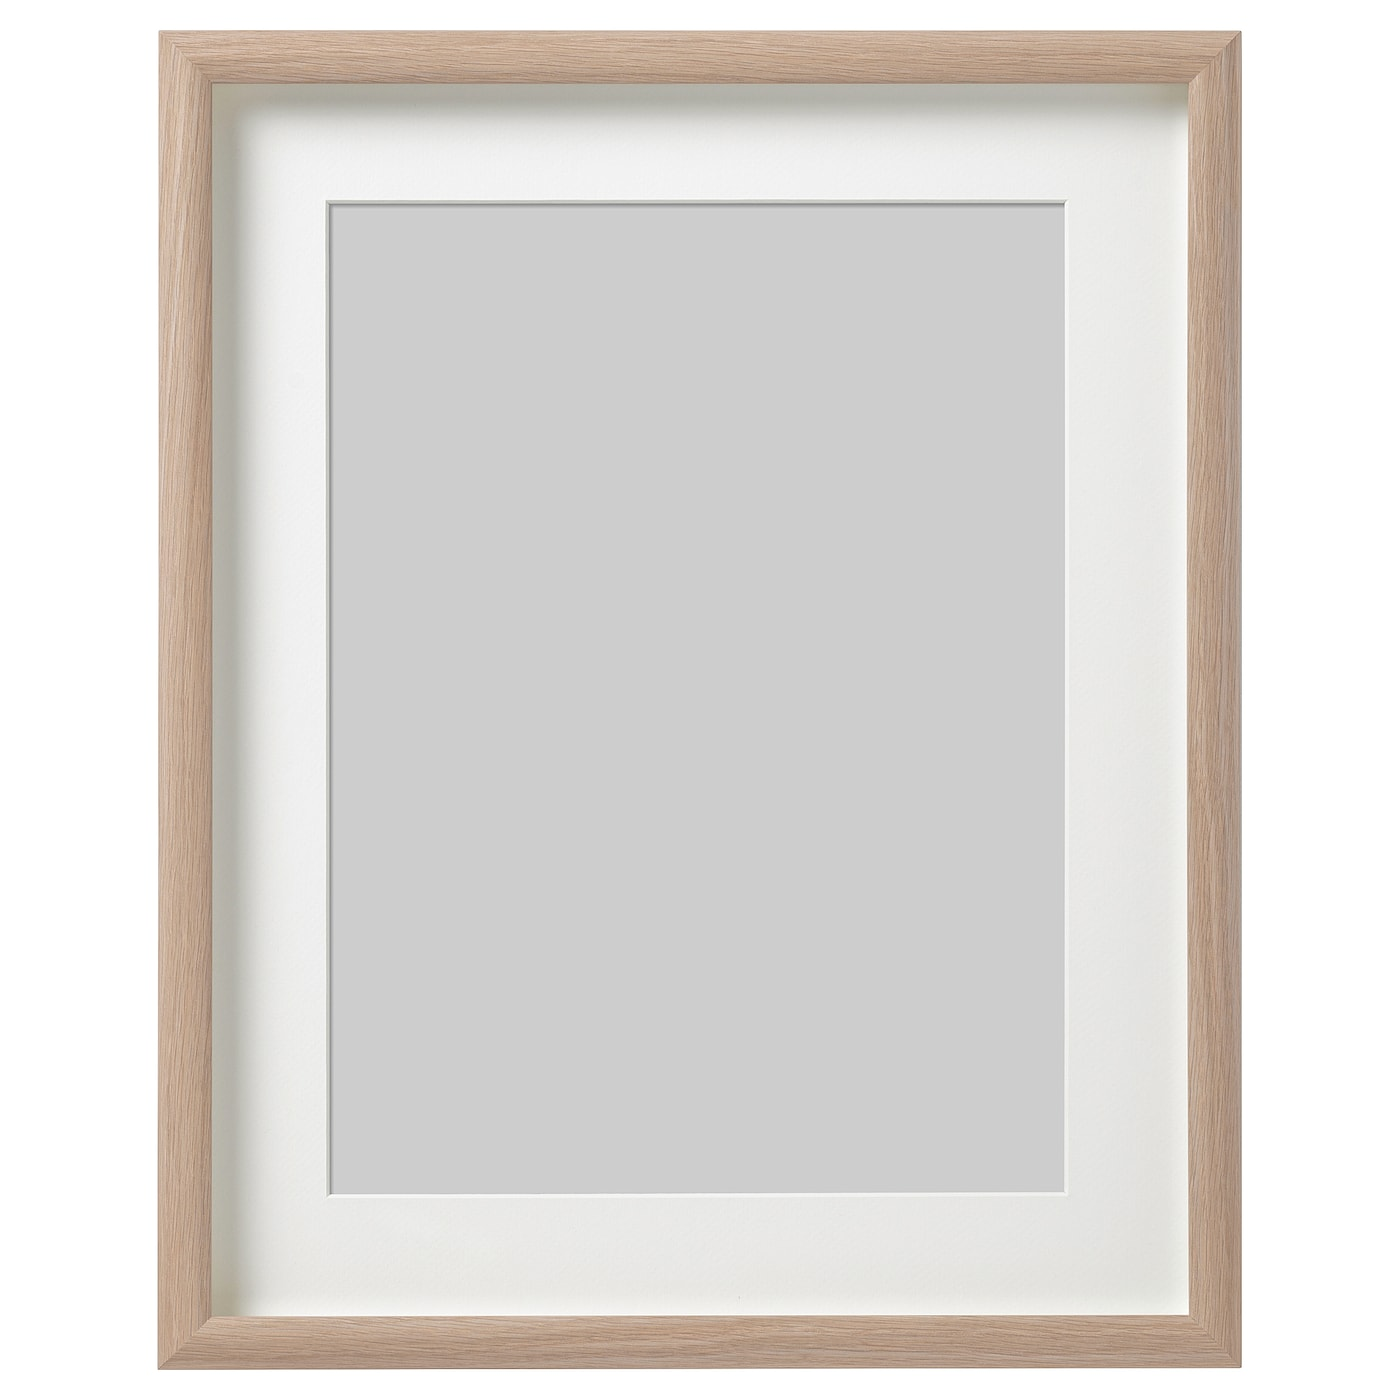 MOSSEBO Marco Efecto roble tinte blanco 40 x 50 cm - IKEA